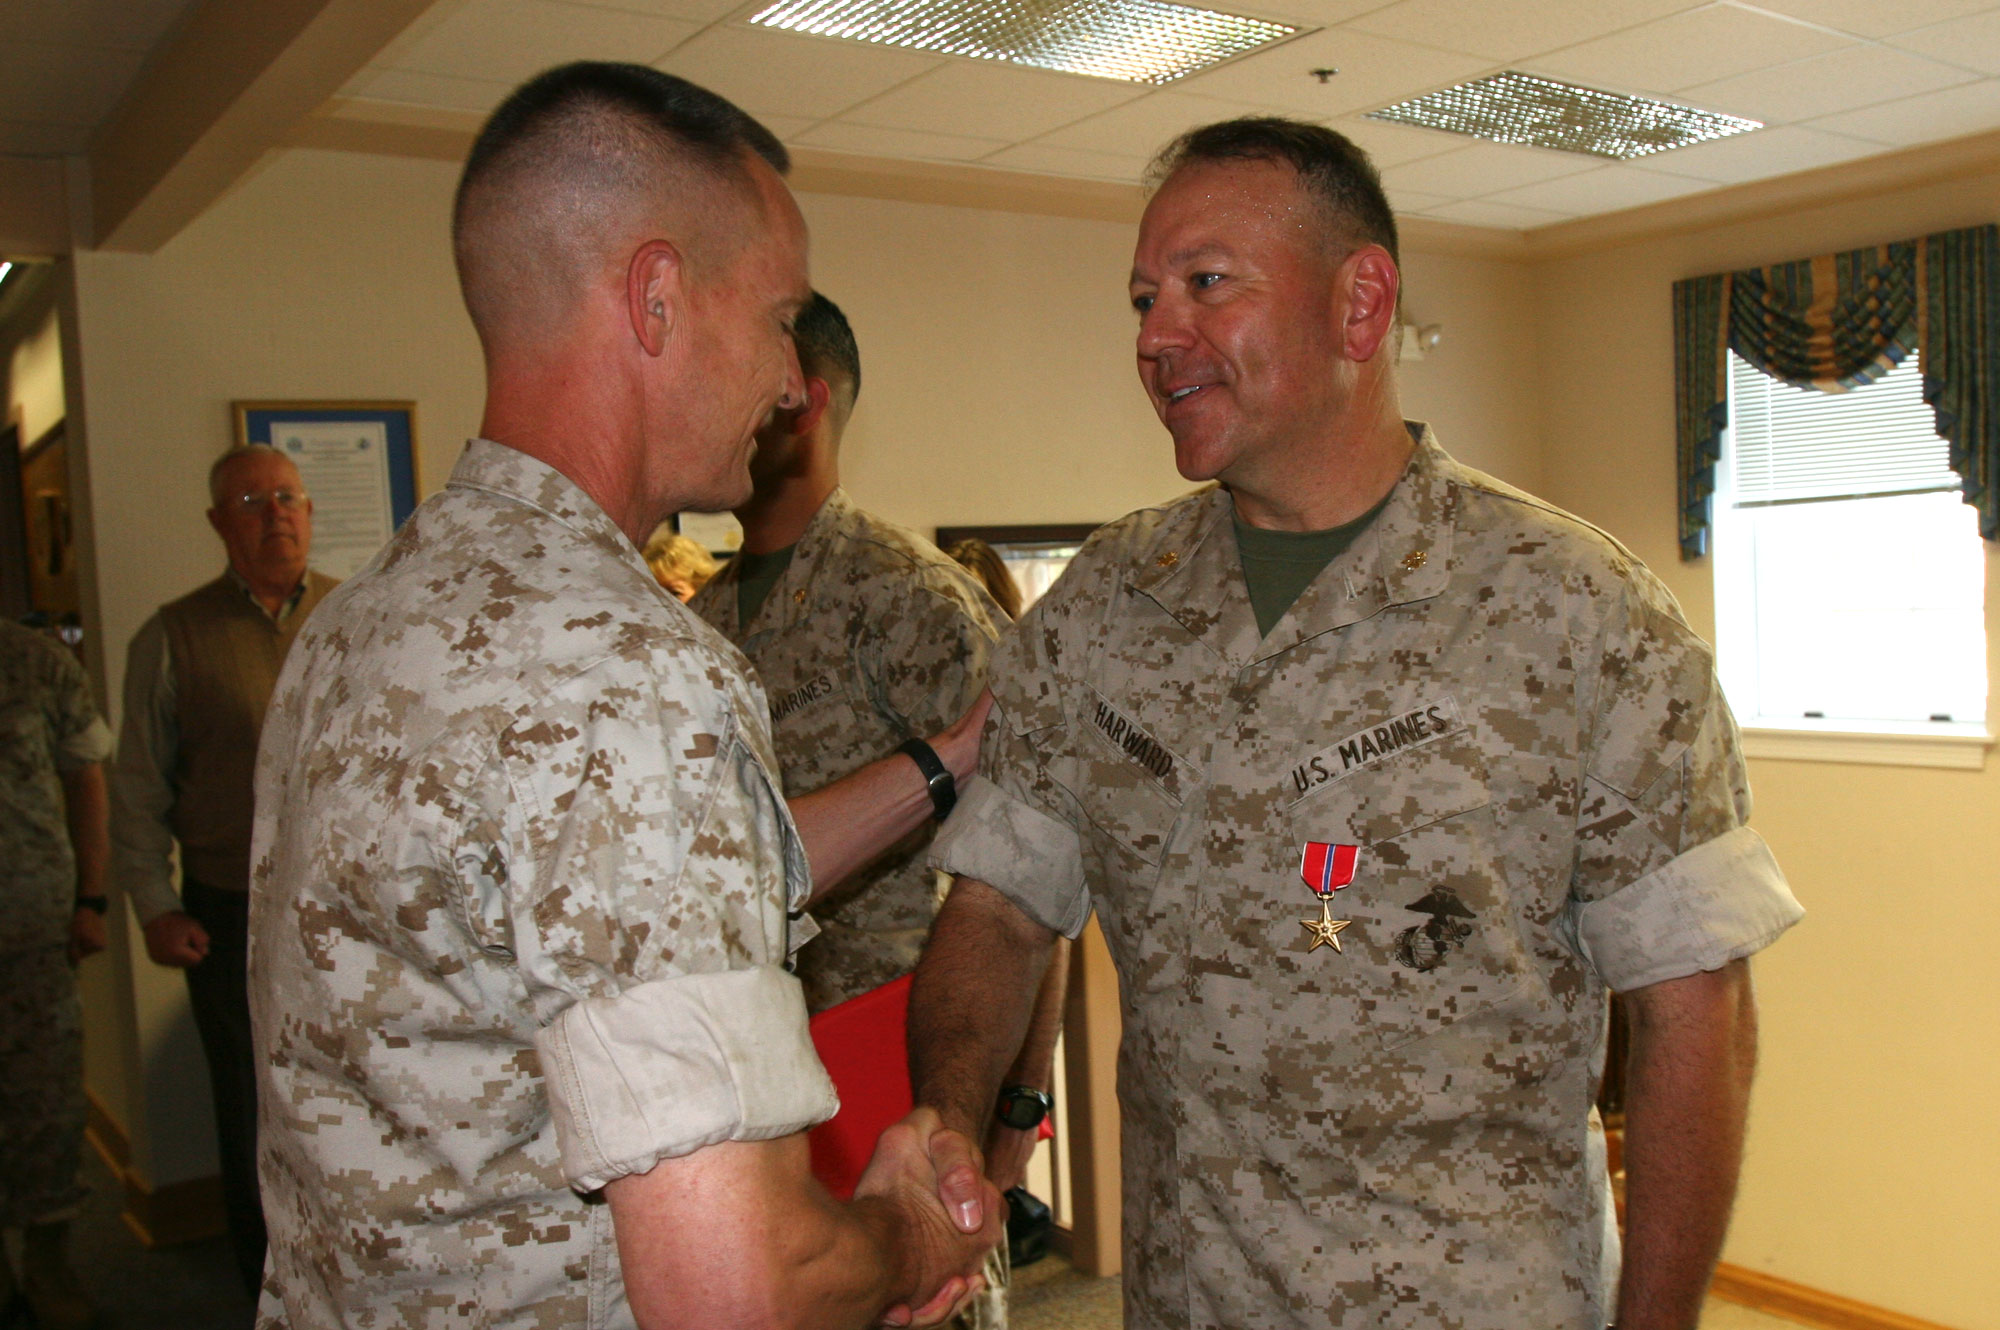 harward-soldier-handshake